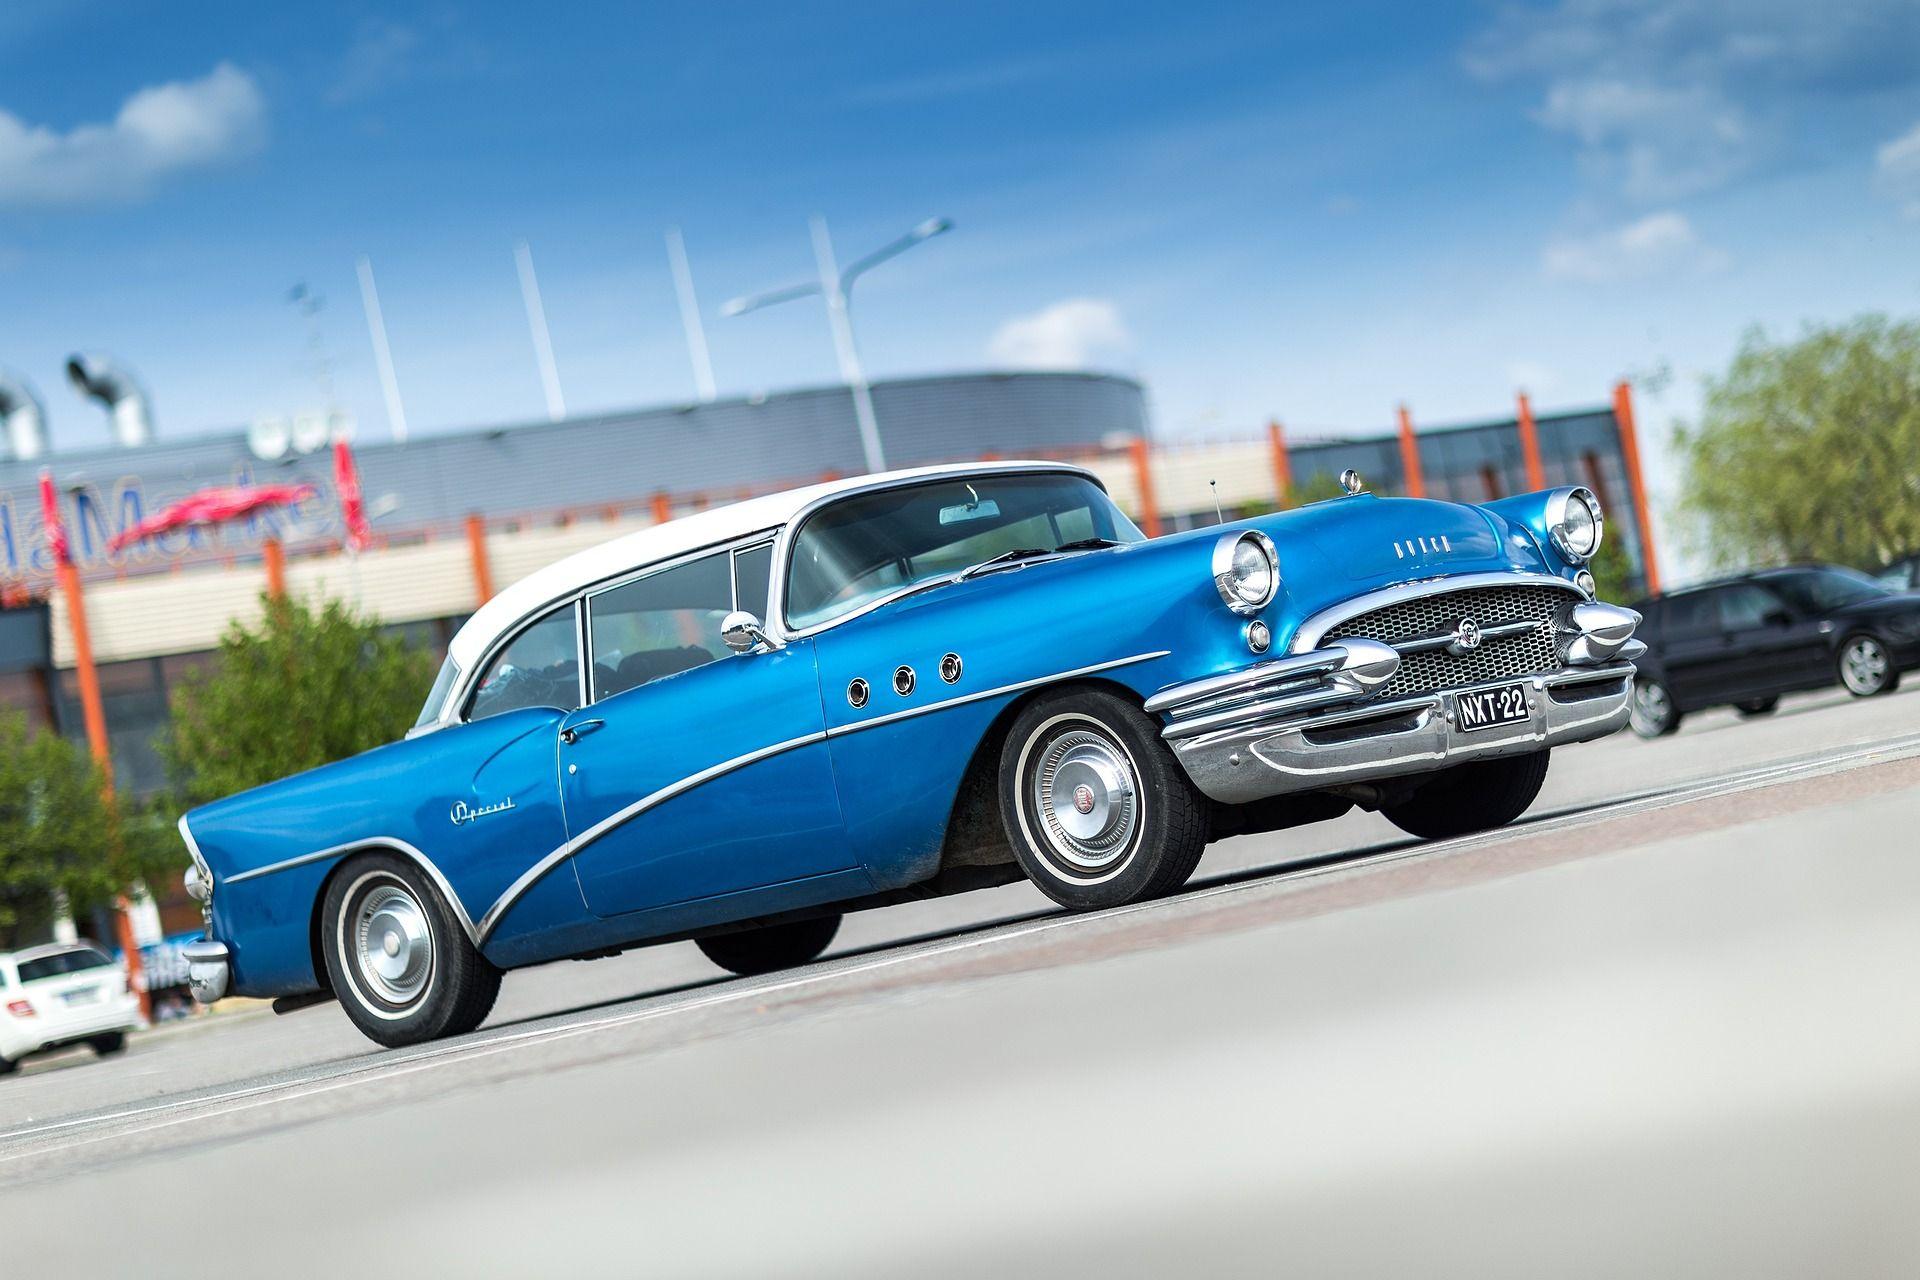 http://classic-auto-trader.blogspot.com | Classic Auto Trader ...